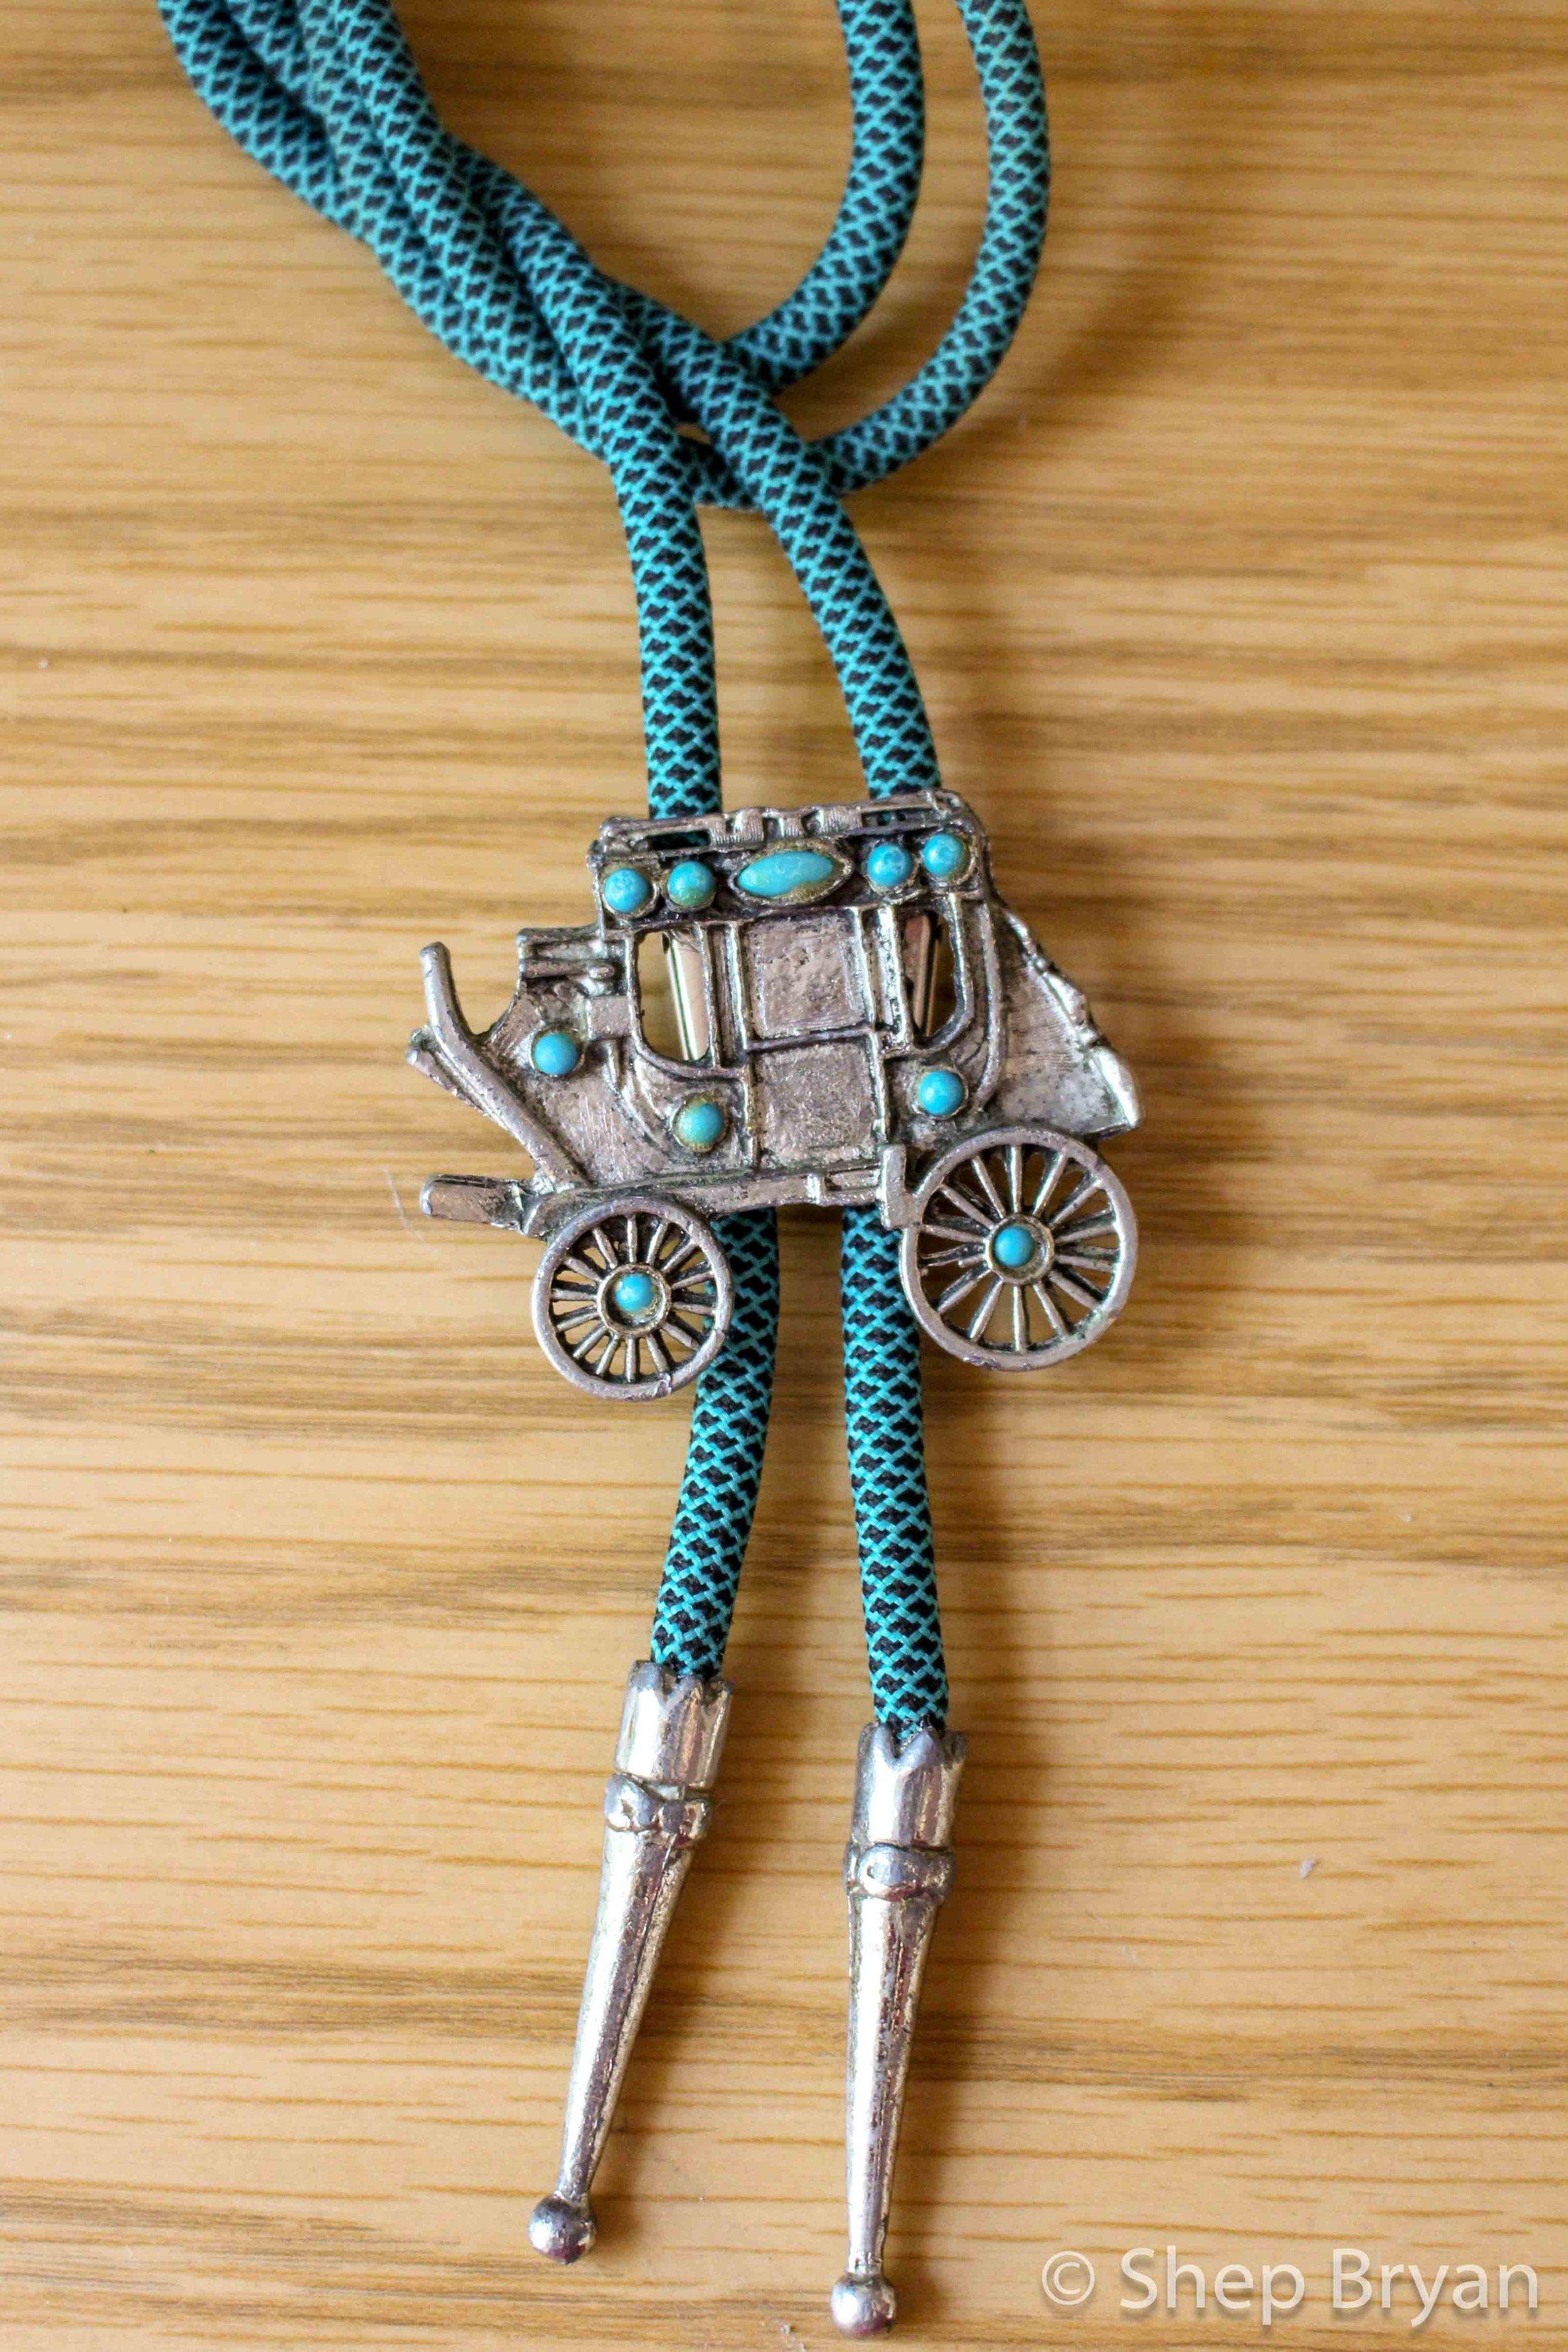 vintage bolo tie repair - final photo.jpg